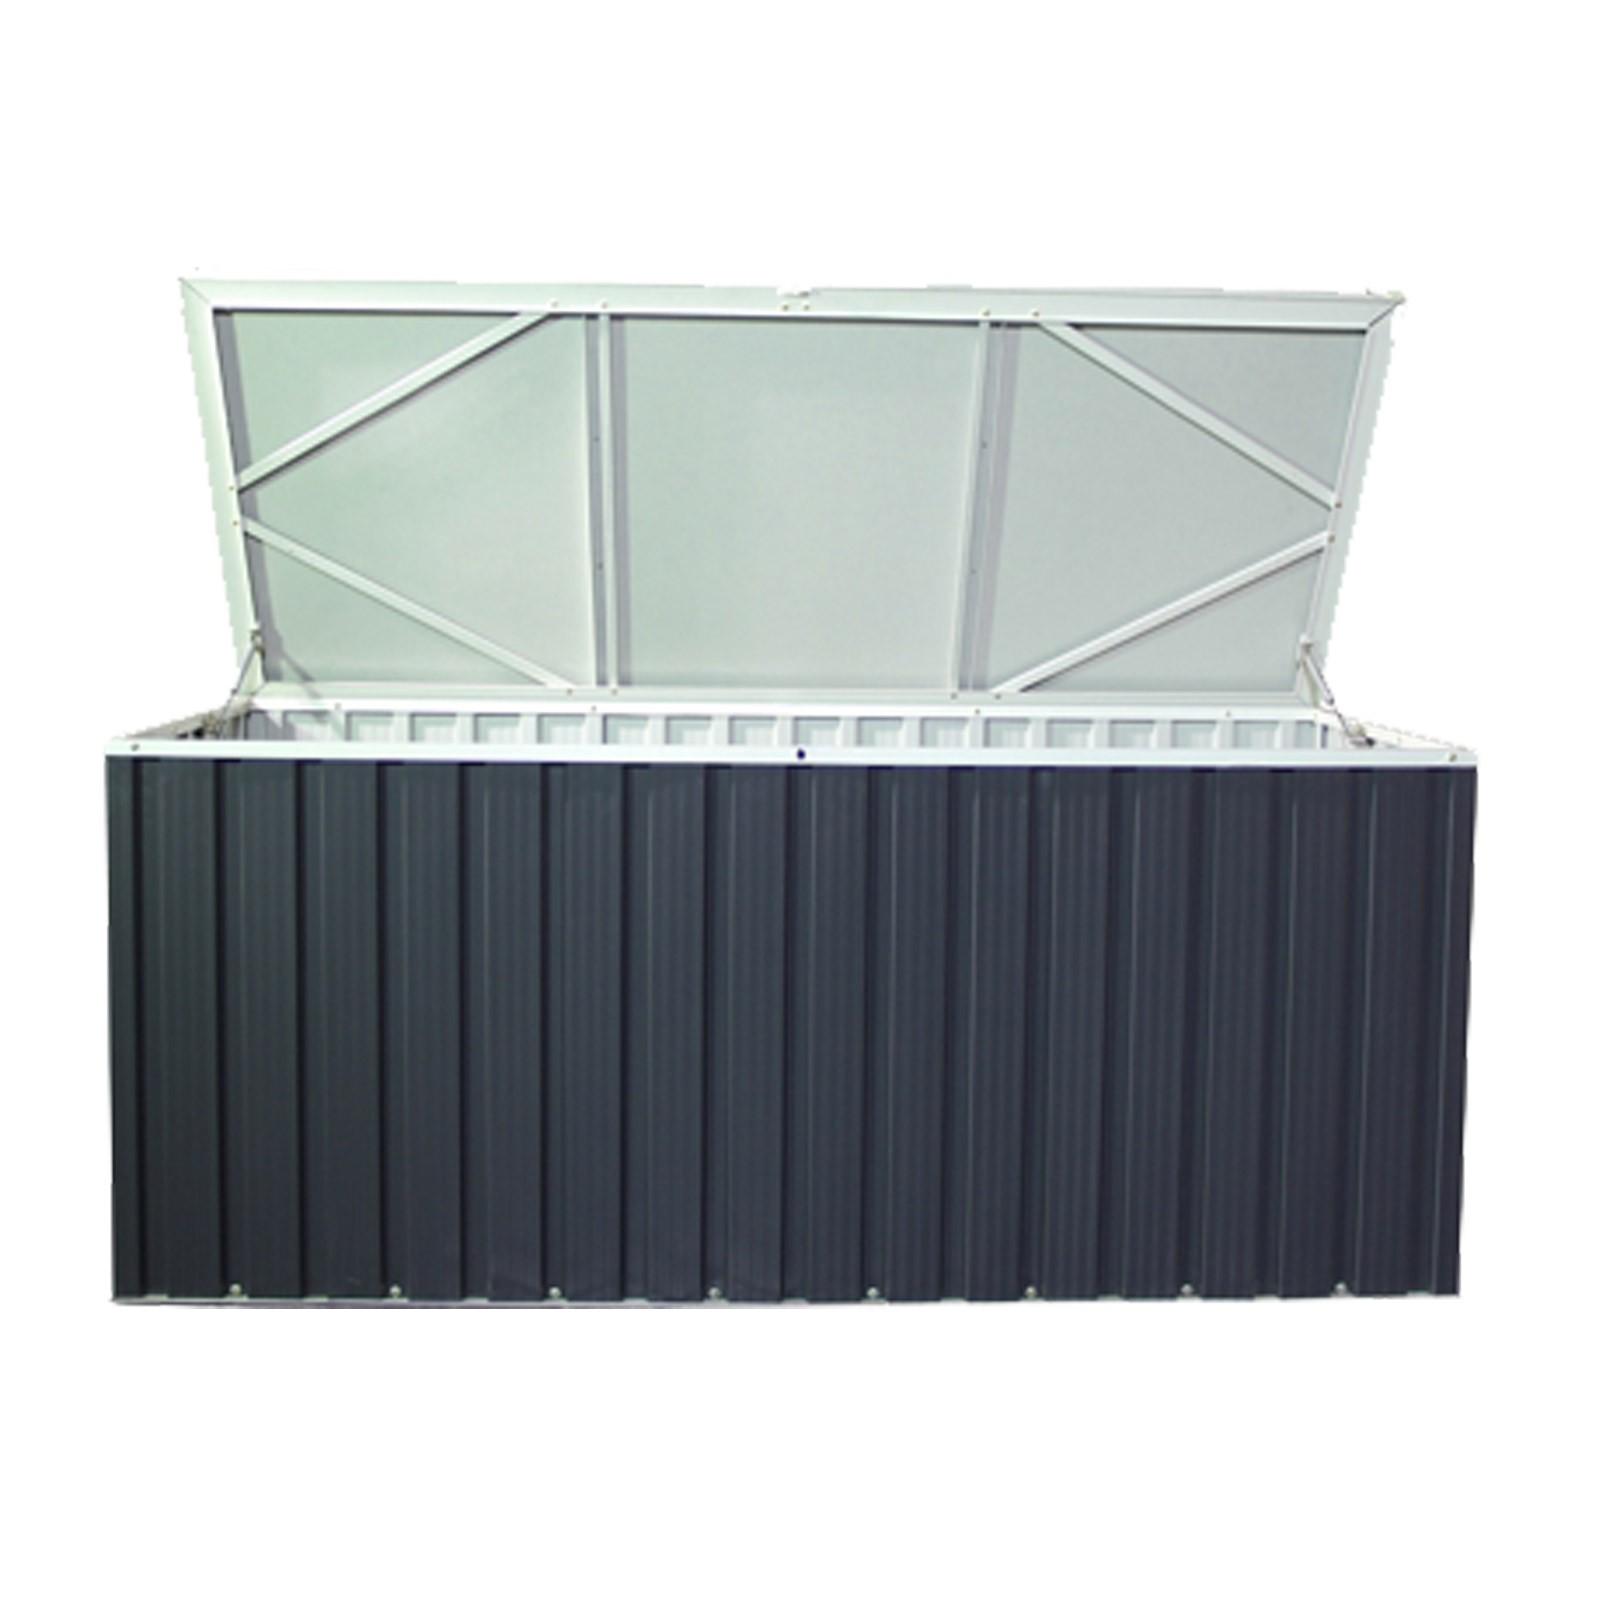 tepro metall ger tebox auflagenbox kissenbox gartenbox kissentruhe box 770 liter ebay. Black Bedroom Furniture Sets. Home Design Ideas